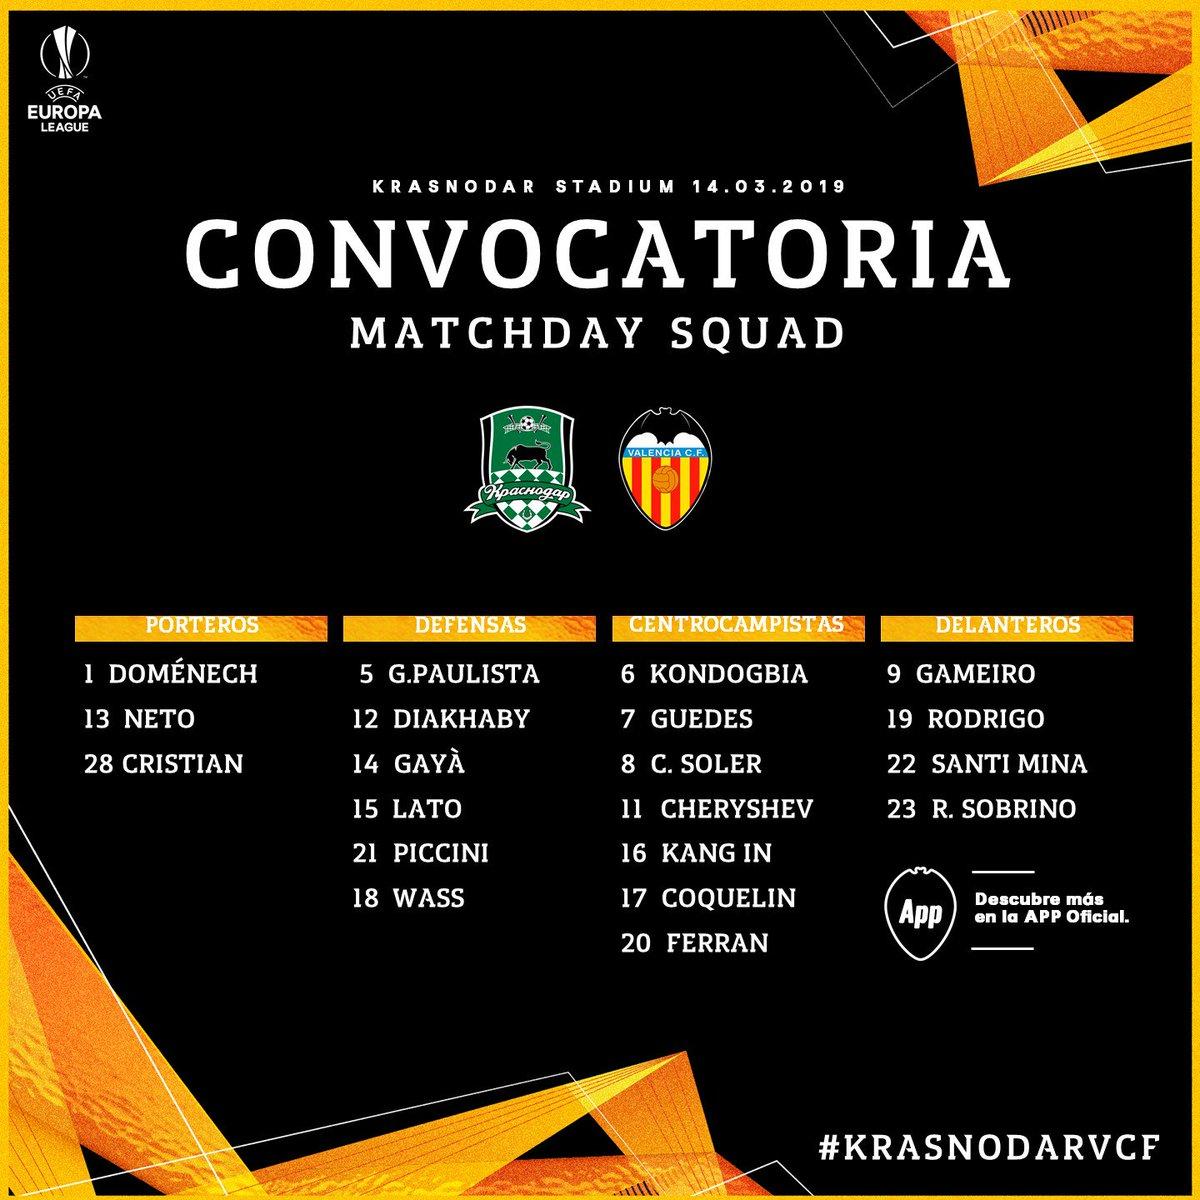 D1dMYgcX4AEOnRq Marcelino se lleva a 20 jugadores a Krasnodar - Comunio-Biwenger